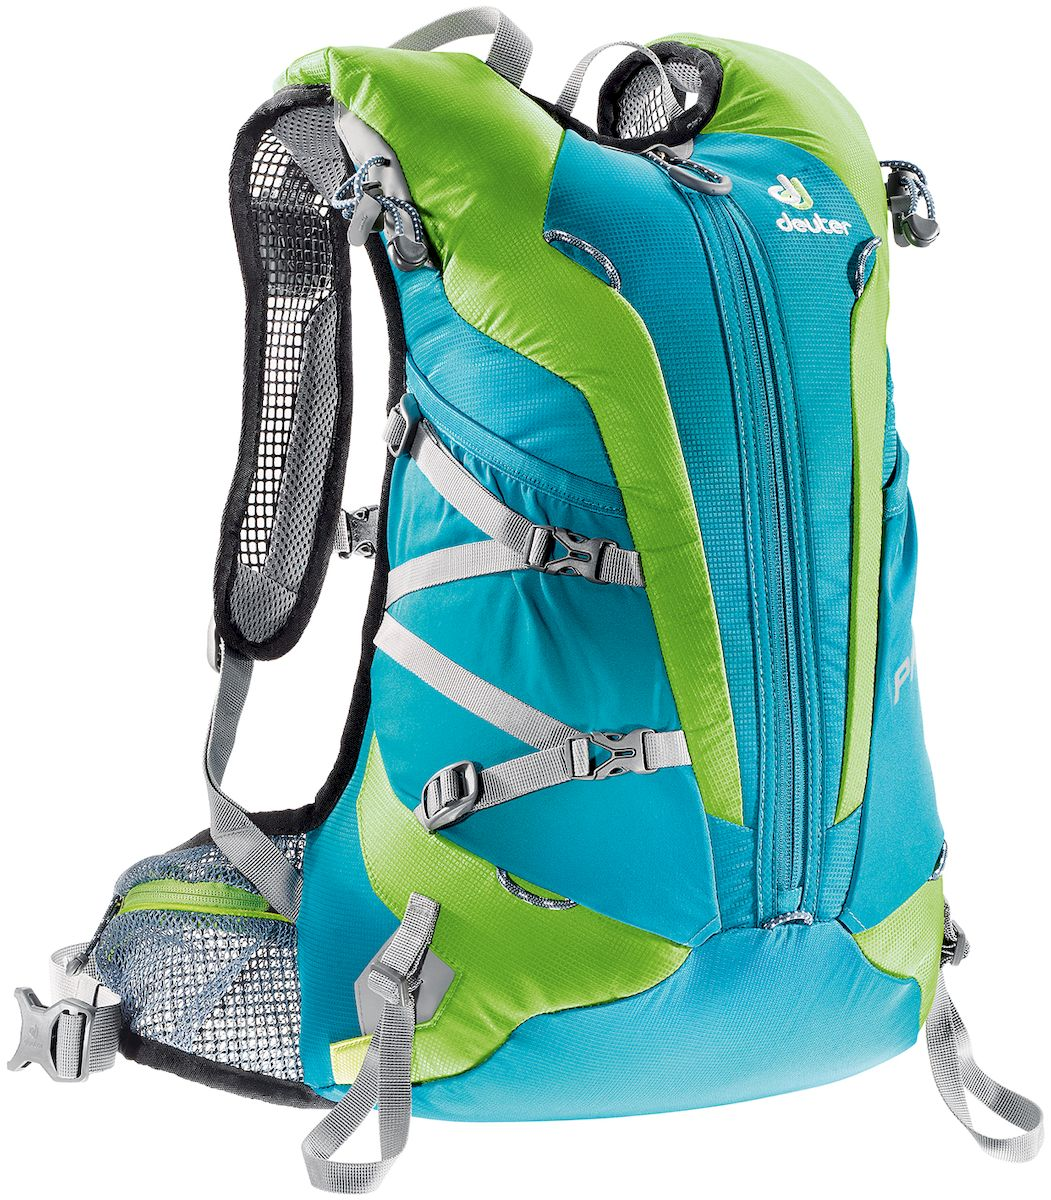 Рюкзак Deuter Pace 20 Petrol-Kiwi, цвет: салатовый, голубой, 20 л рюкзак deuter daypacks giga kiwi emerald